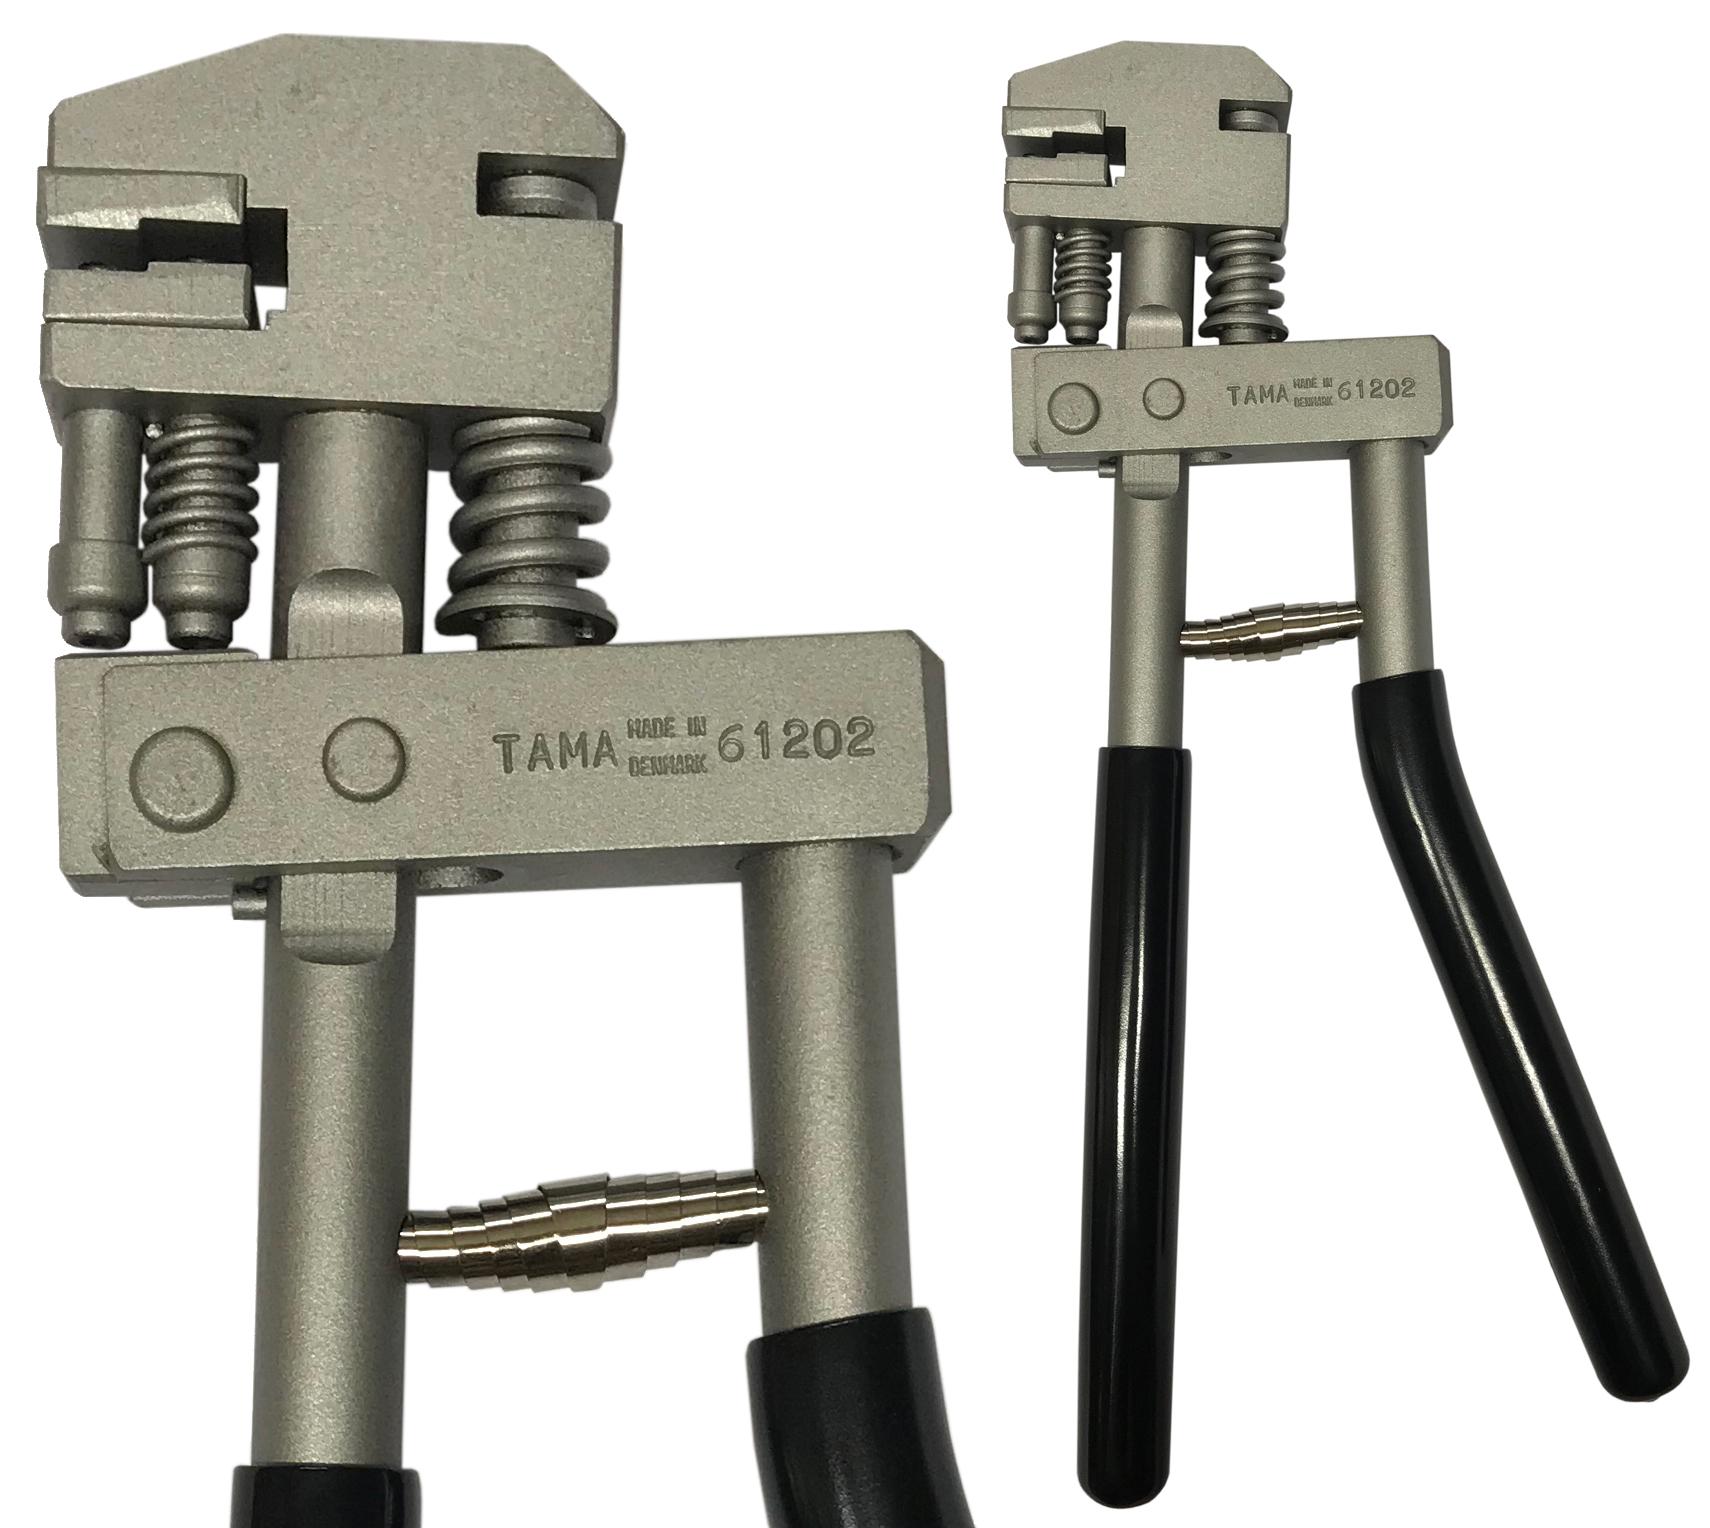 Motorhauben Schweißer Karosserie Gripzange LL-TYP 215 mm Feststellzange  Türen